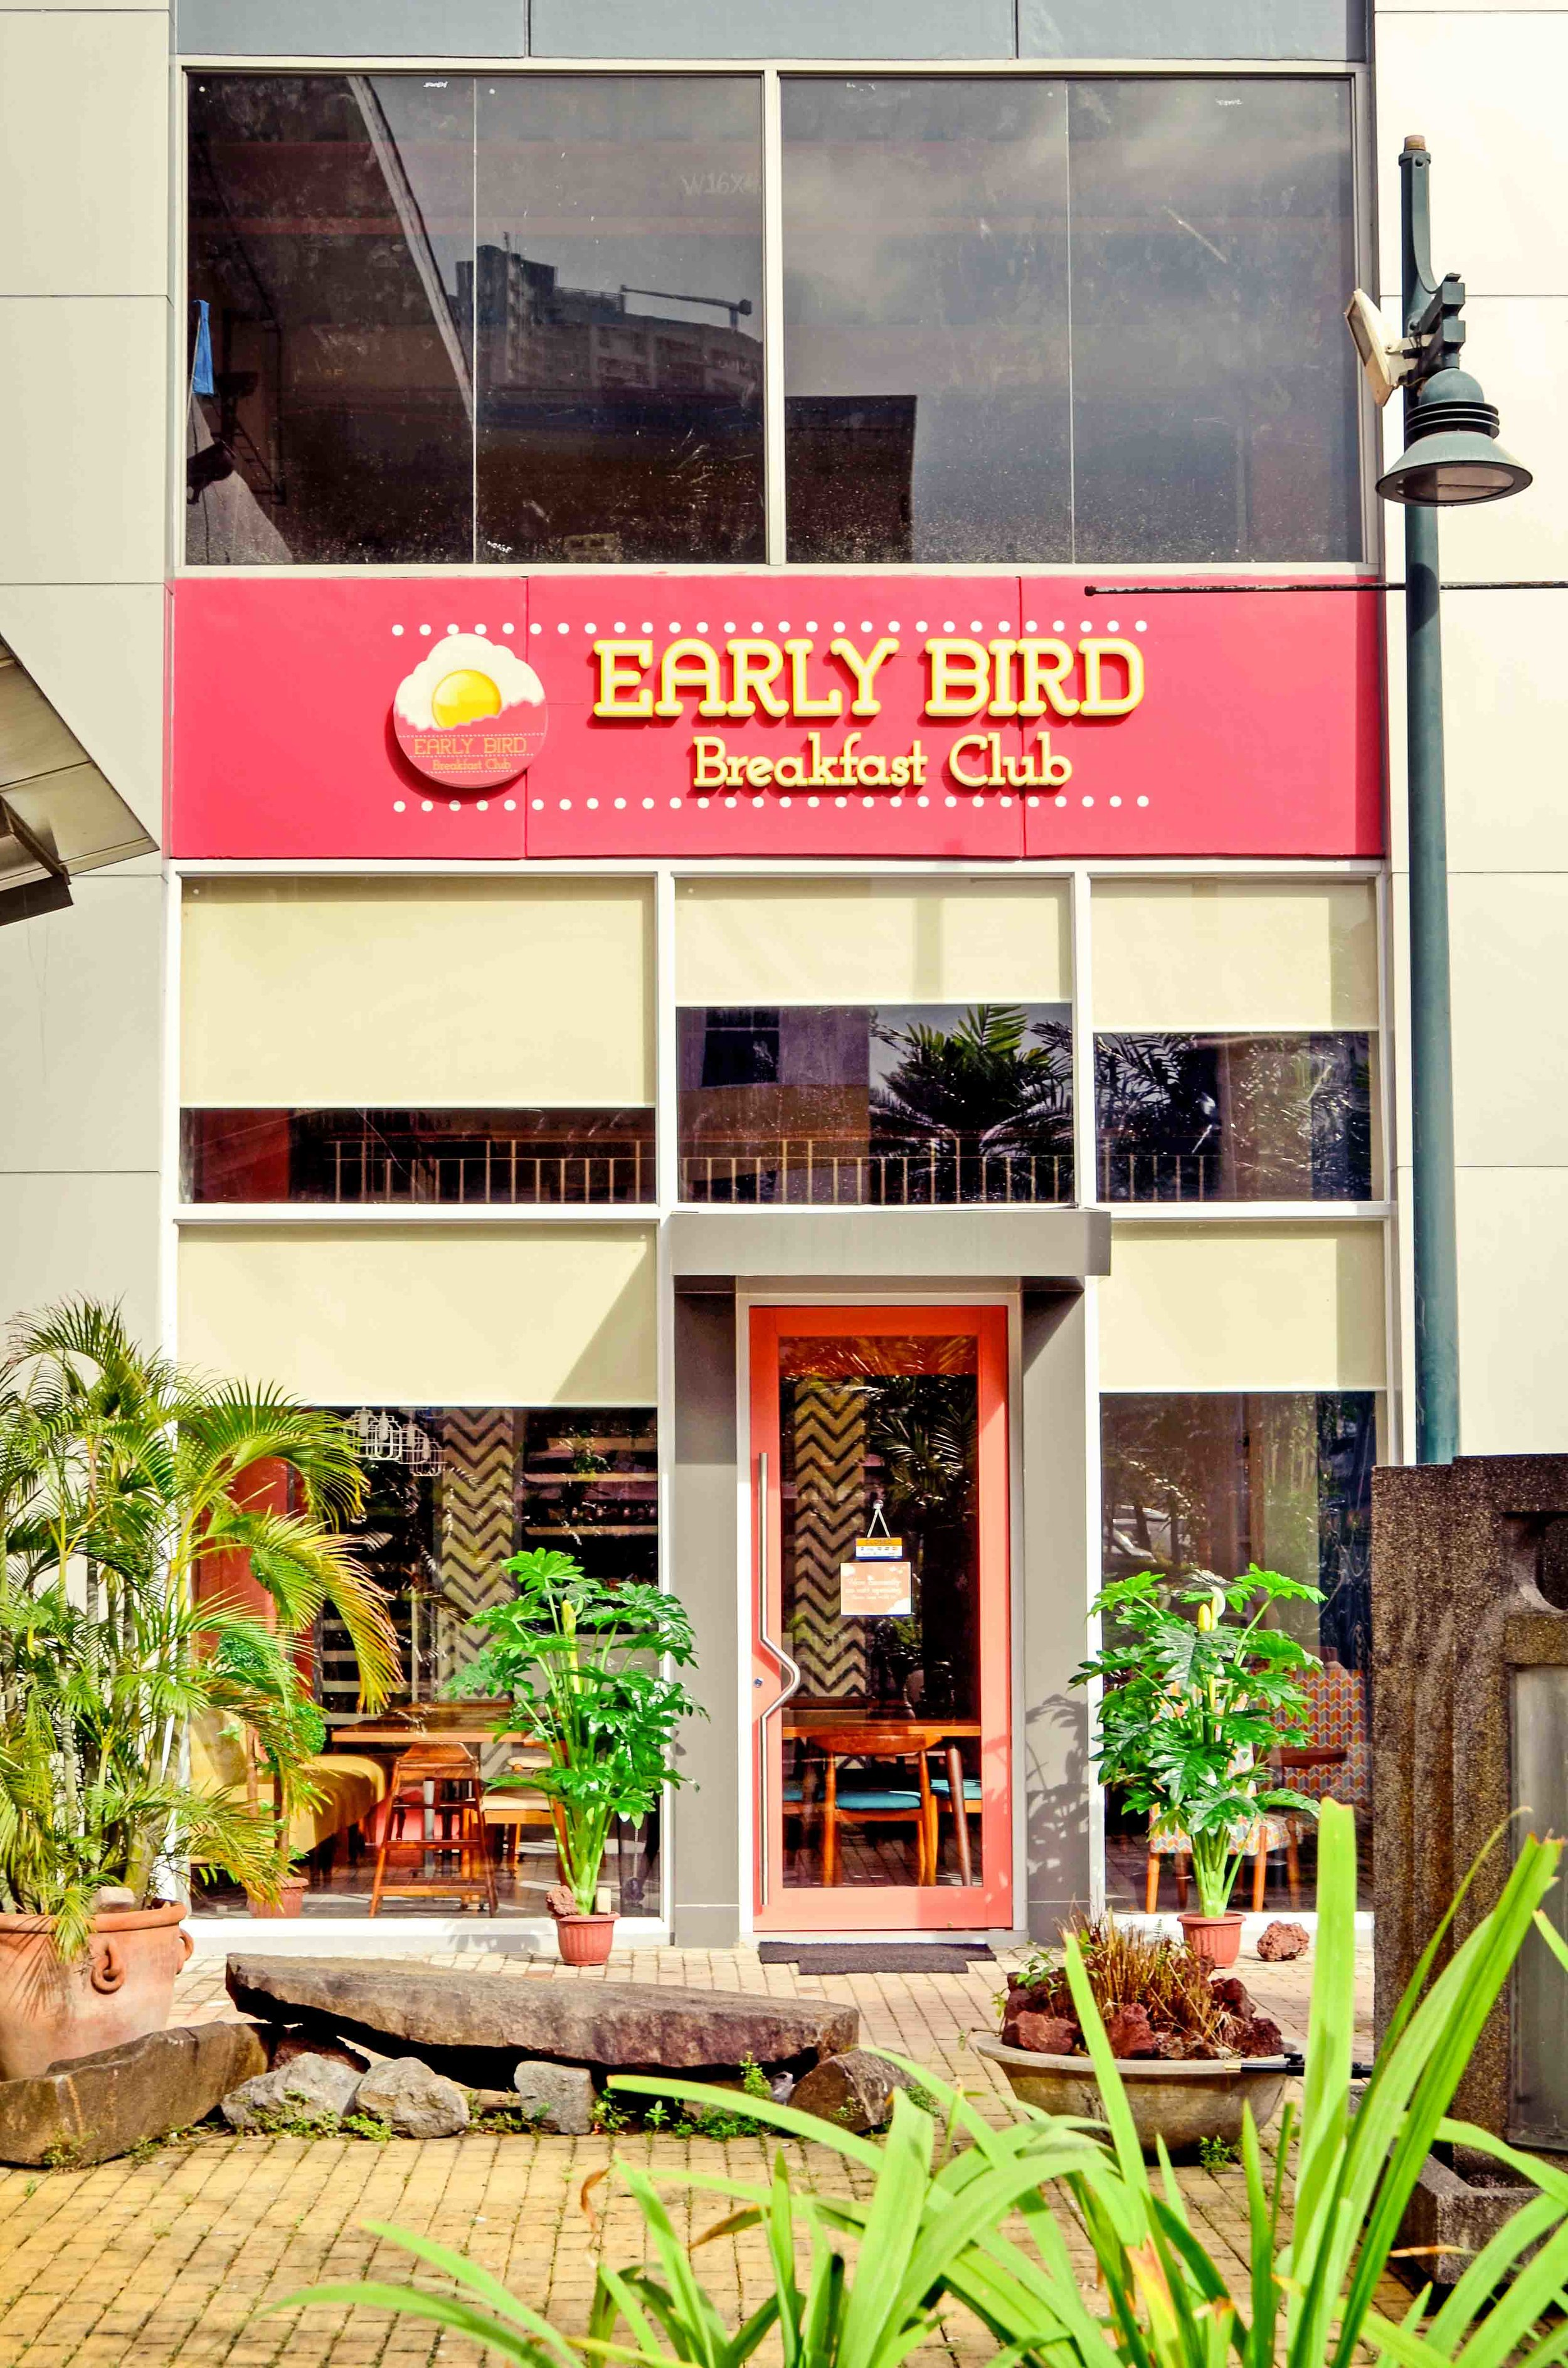 Early Bird BGC